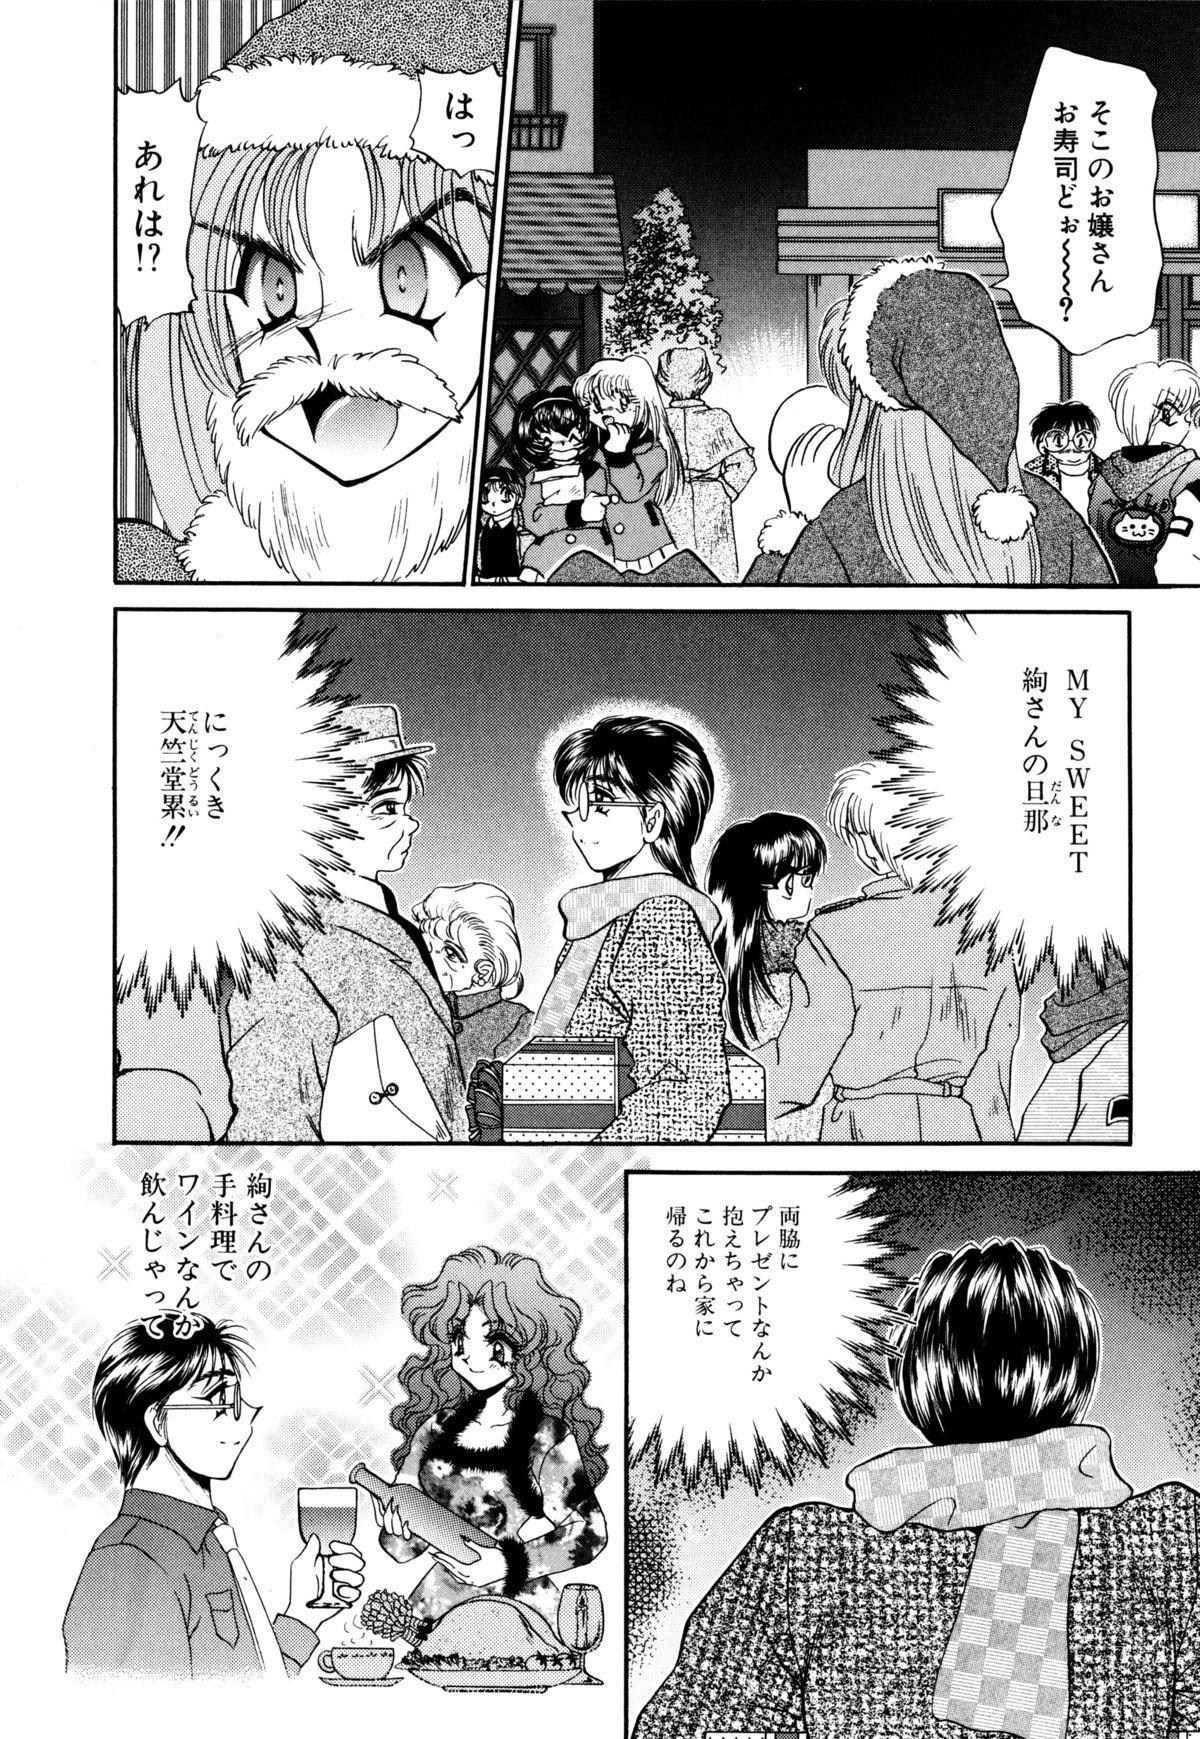 Kigurumi Sentai Quiltian 92